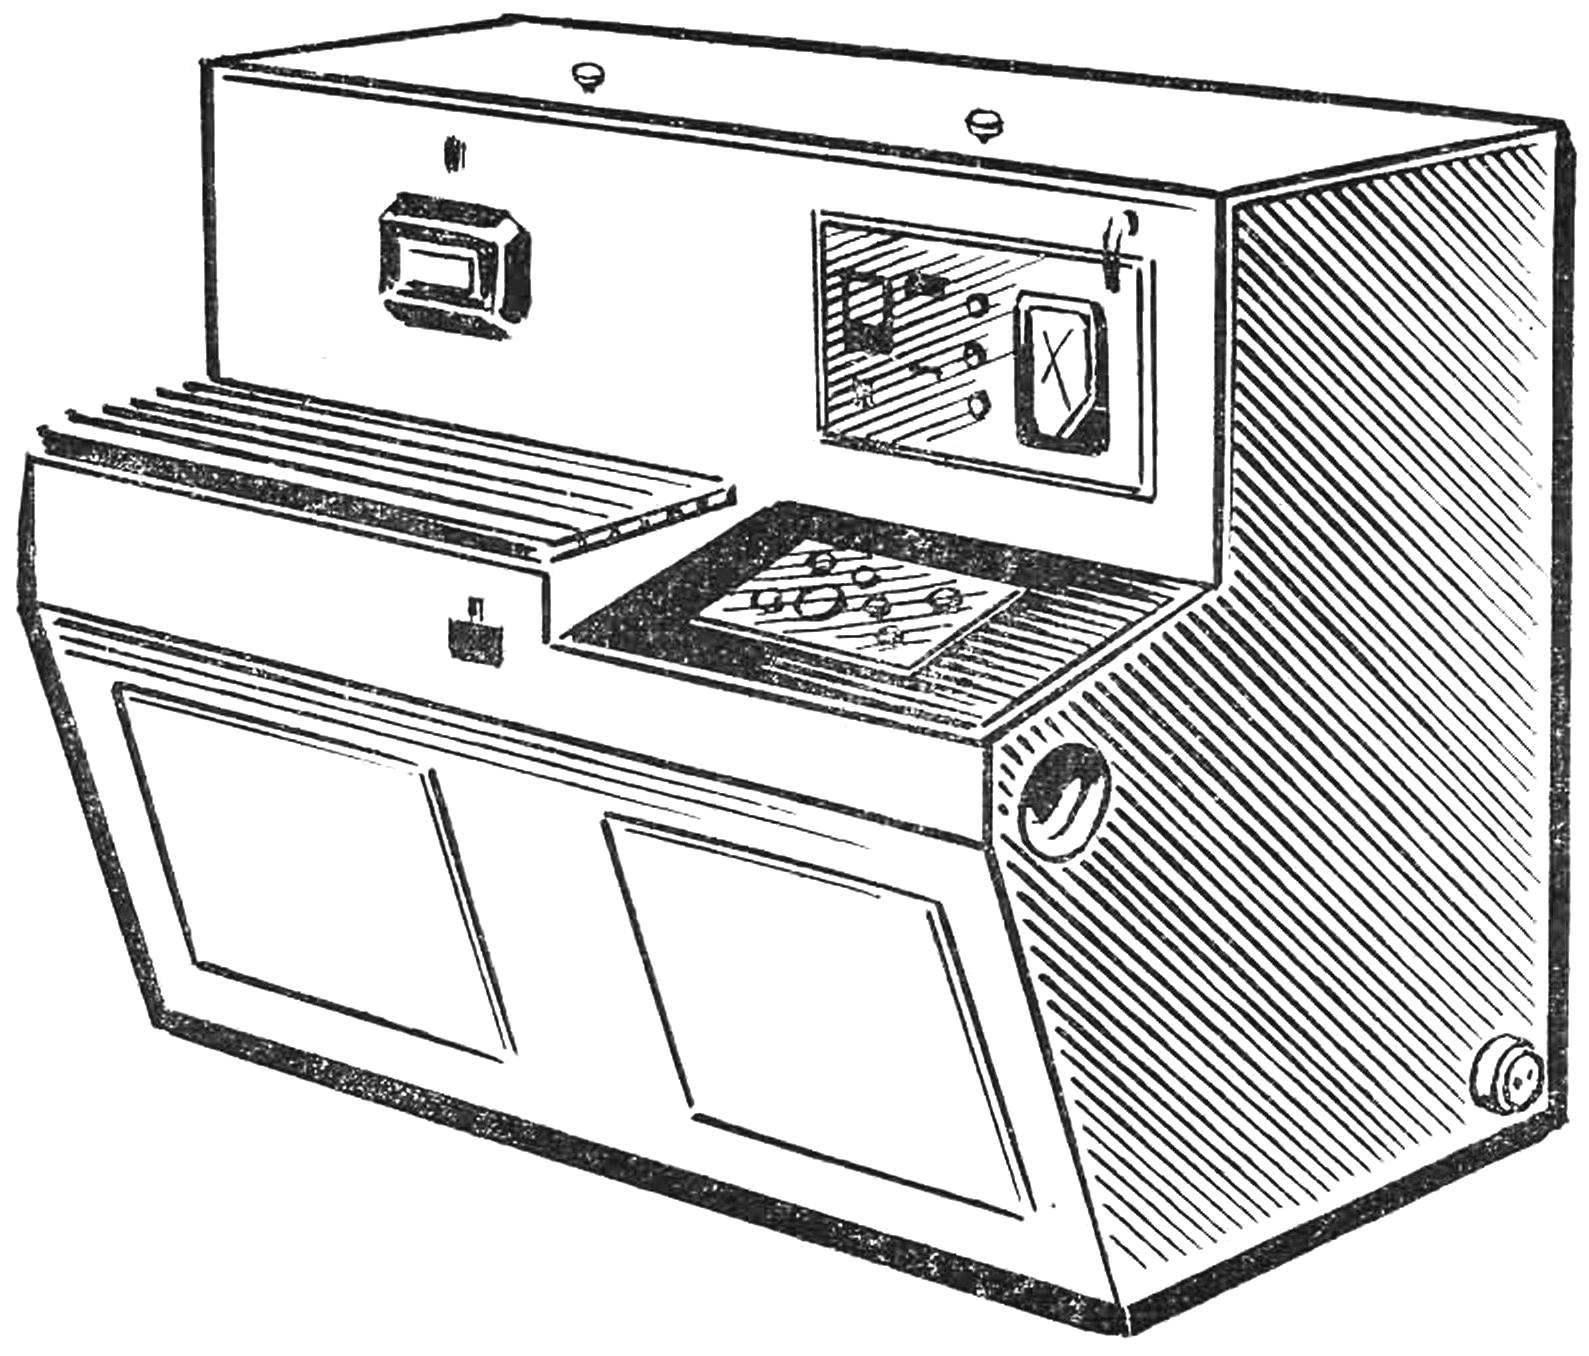 Рис. 4. Магнитно-импульсная установка МИУ,